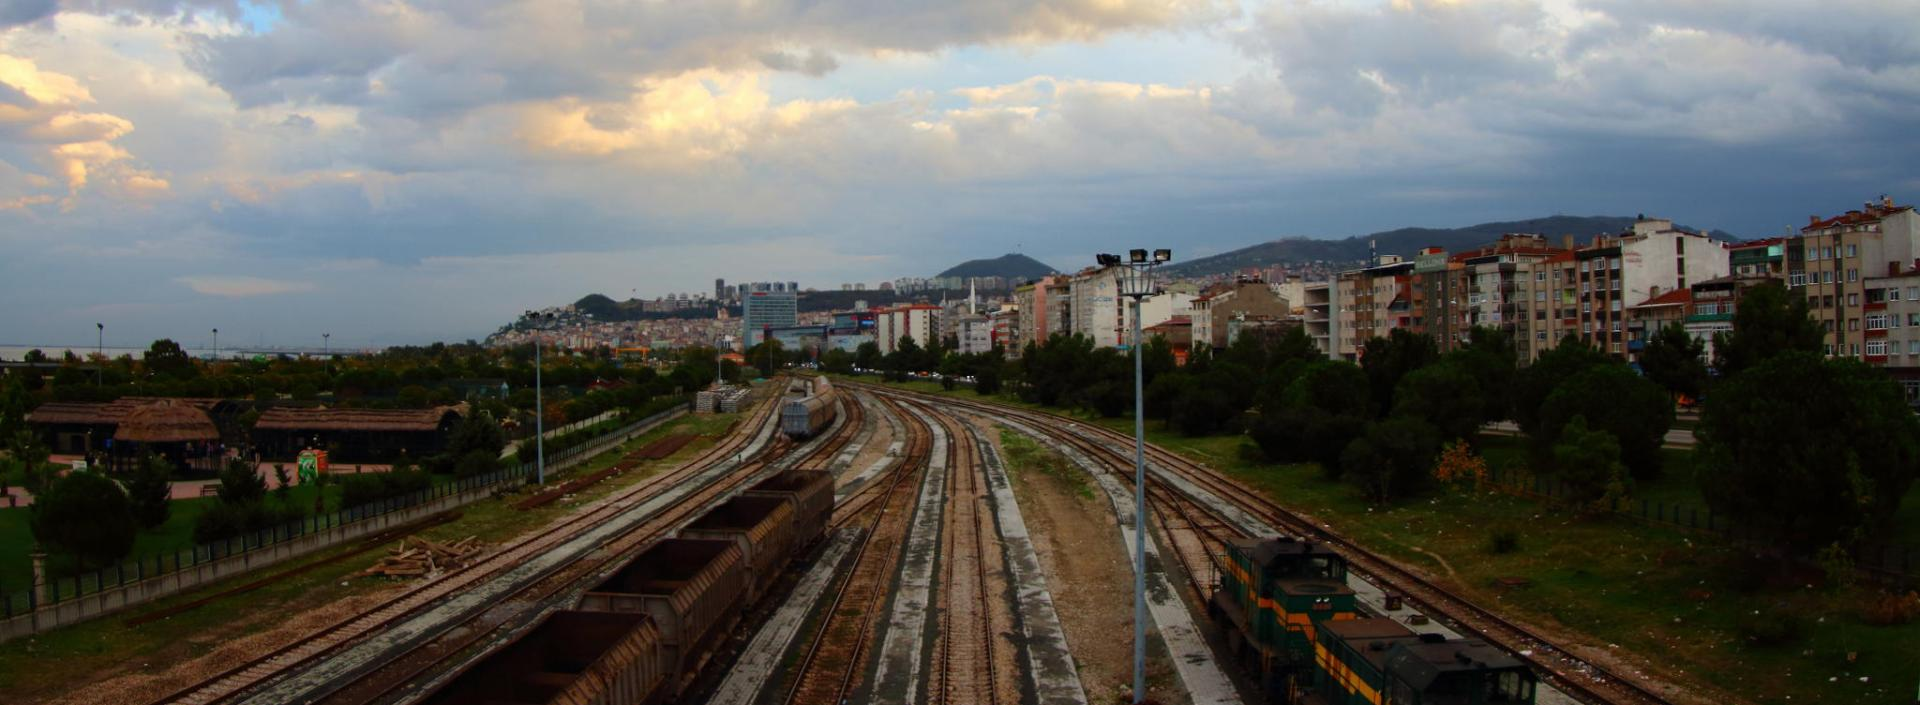 Modernización de la Línea Ferroviaria Samsun - KalinModernisation of the Samsun–Kalin railway line